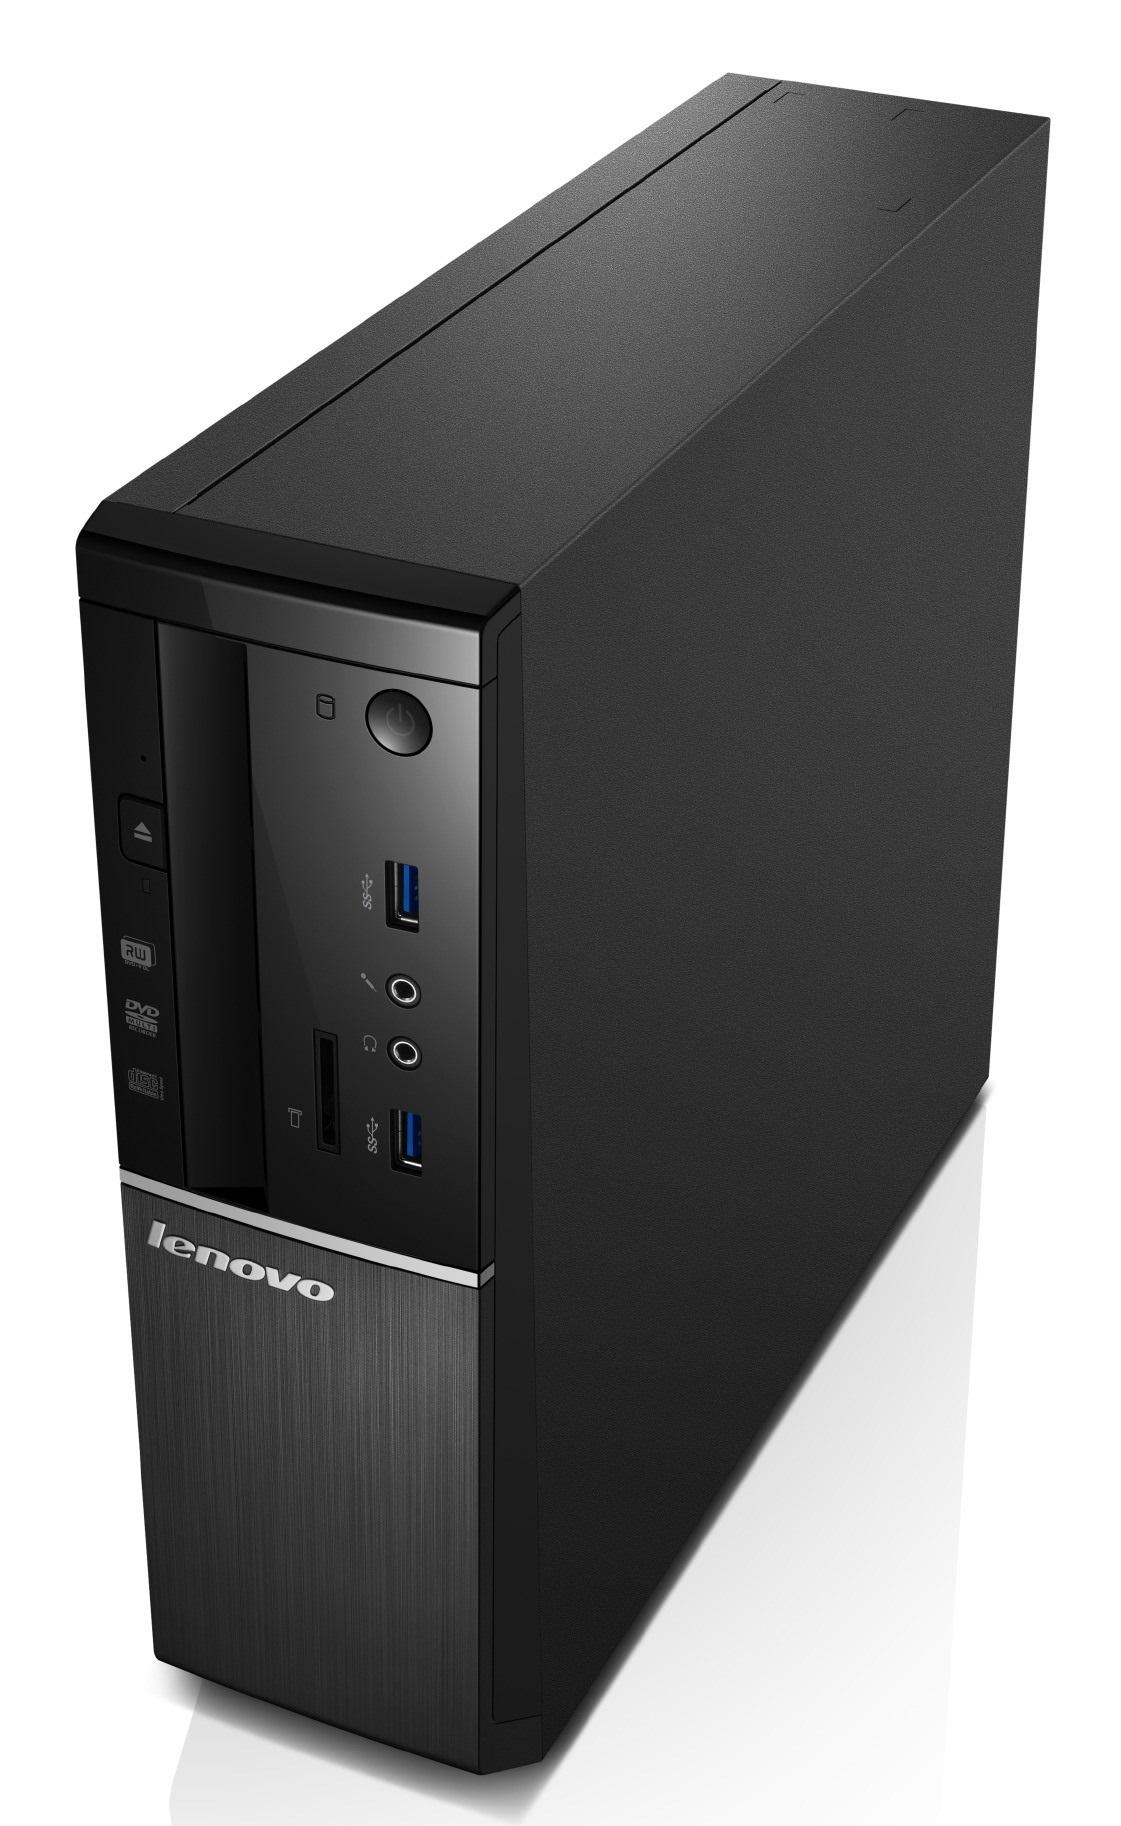 Lenovo IdeaCentre 510S-08IKL Pentium-DC G4560 3,50GHz/4GB/500GB/DVD-RW/SFF/WIN10 90GB002HCK